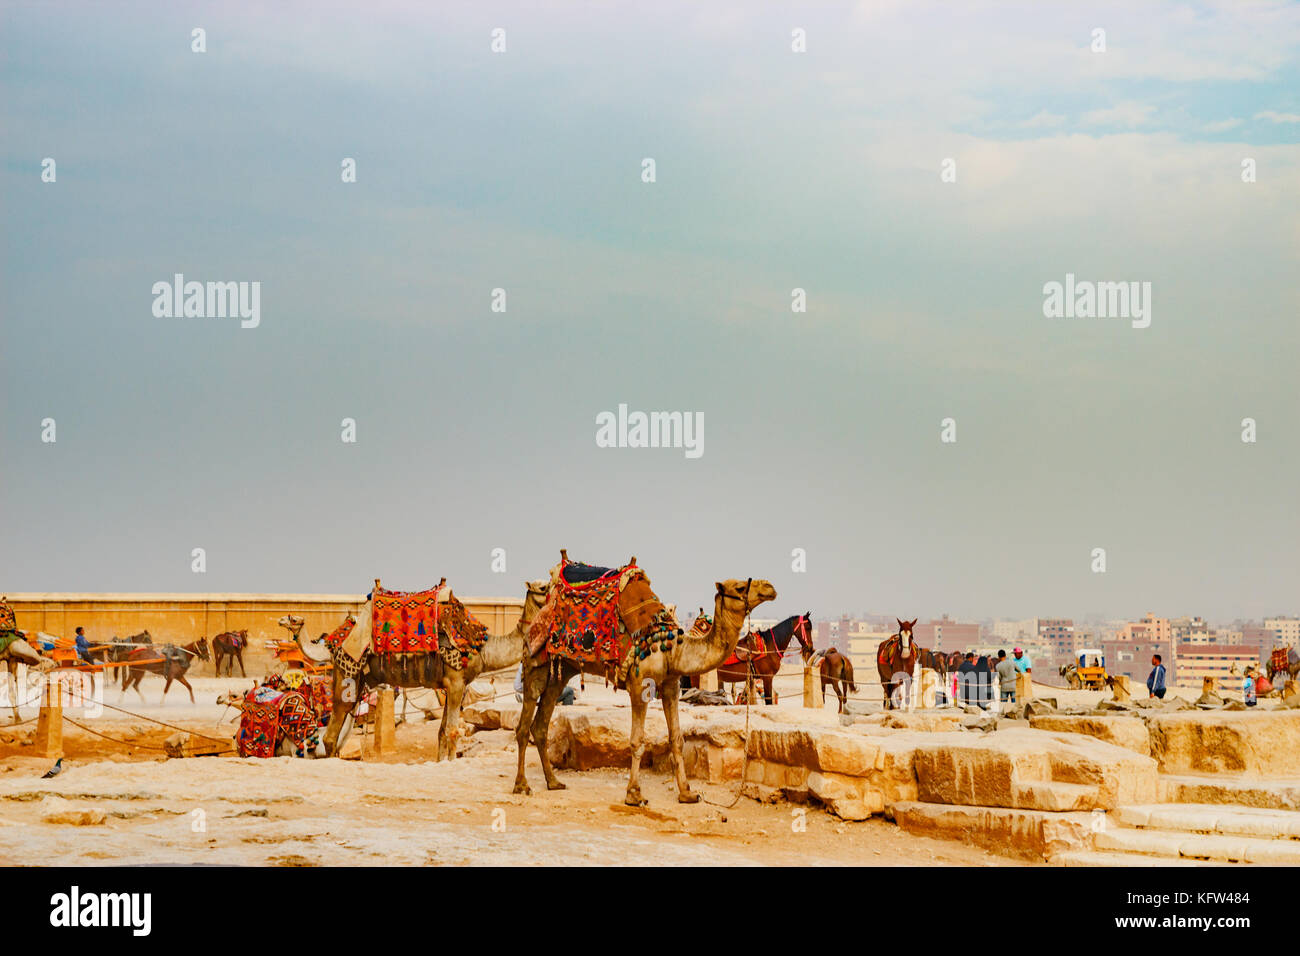 Kamel in der Nähe der alten Pyramide in Kairo, Ägypten Stockbild